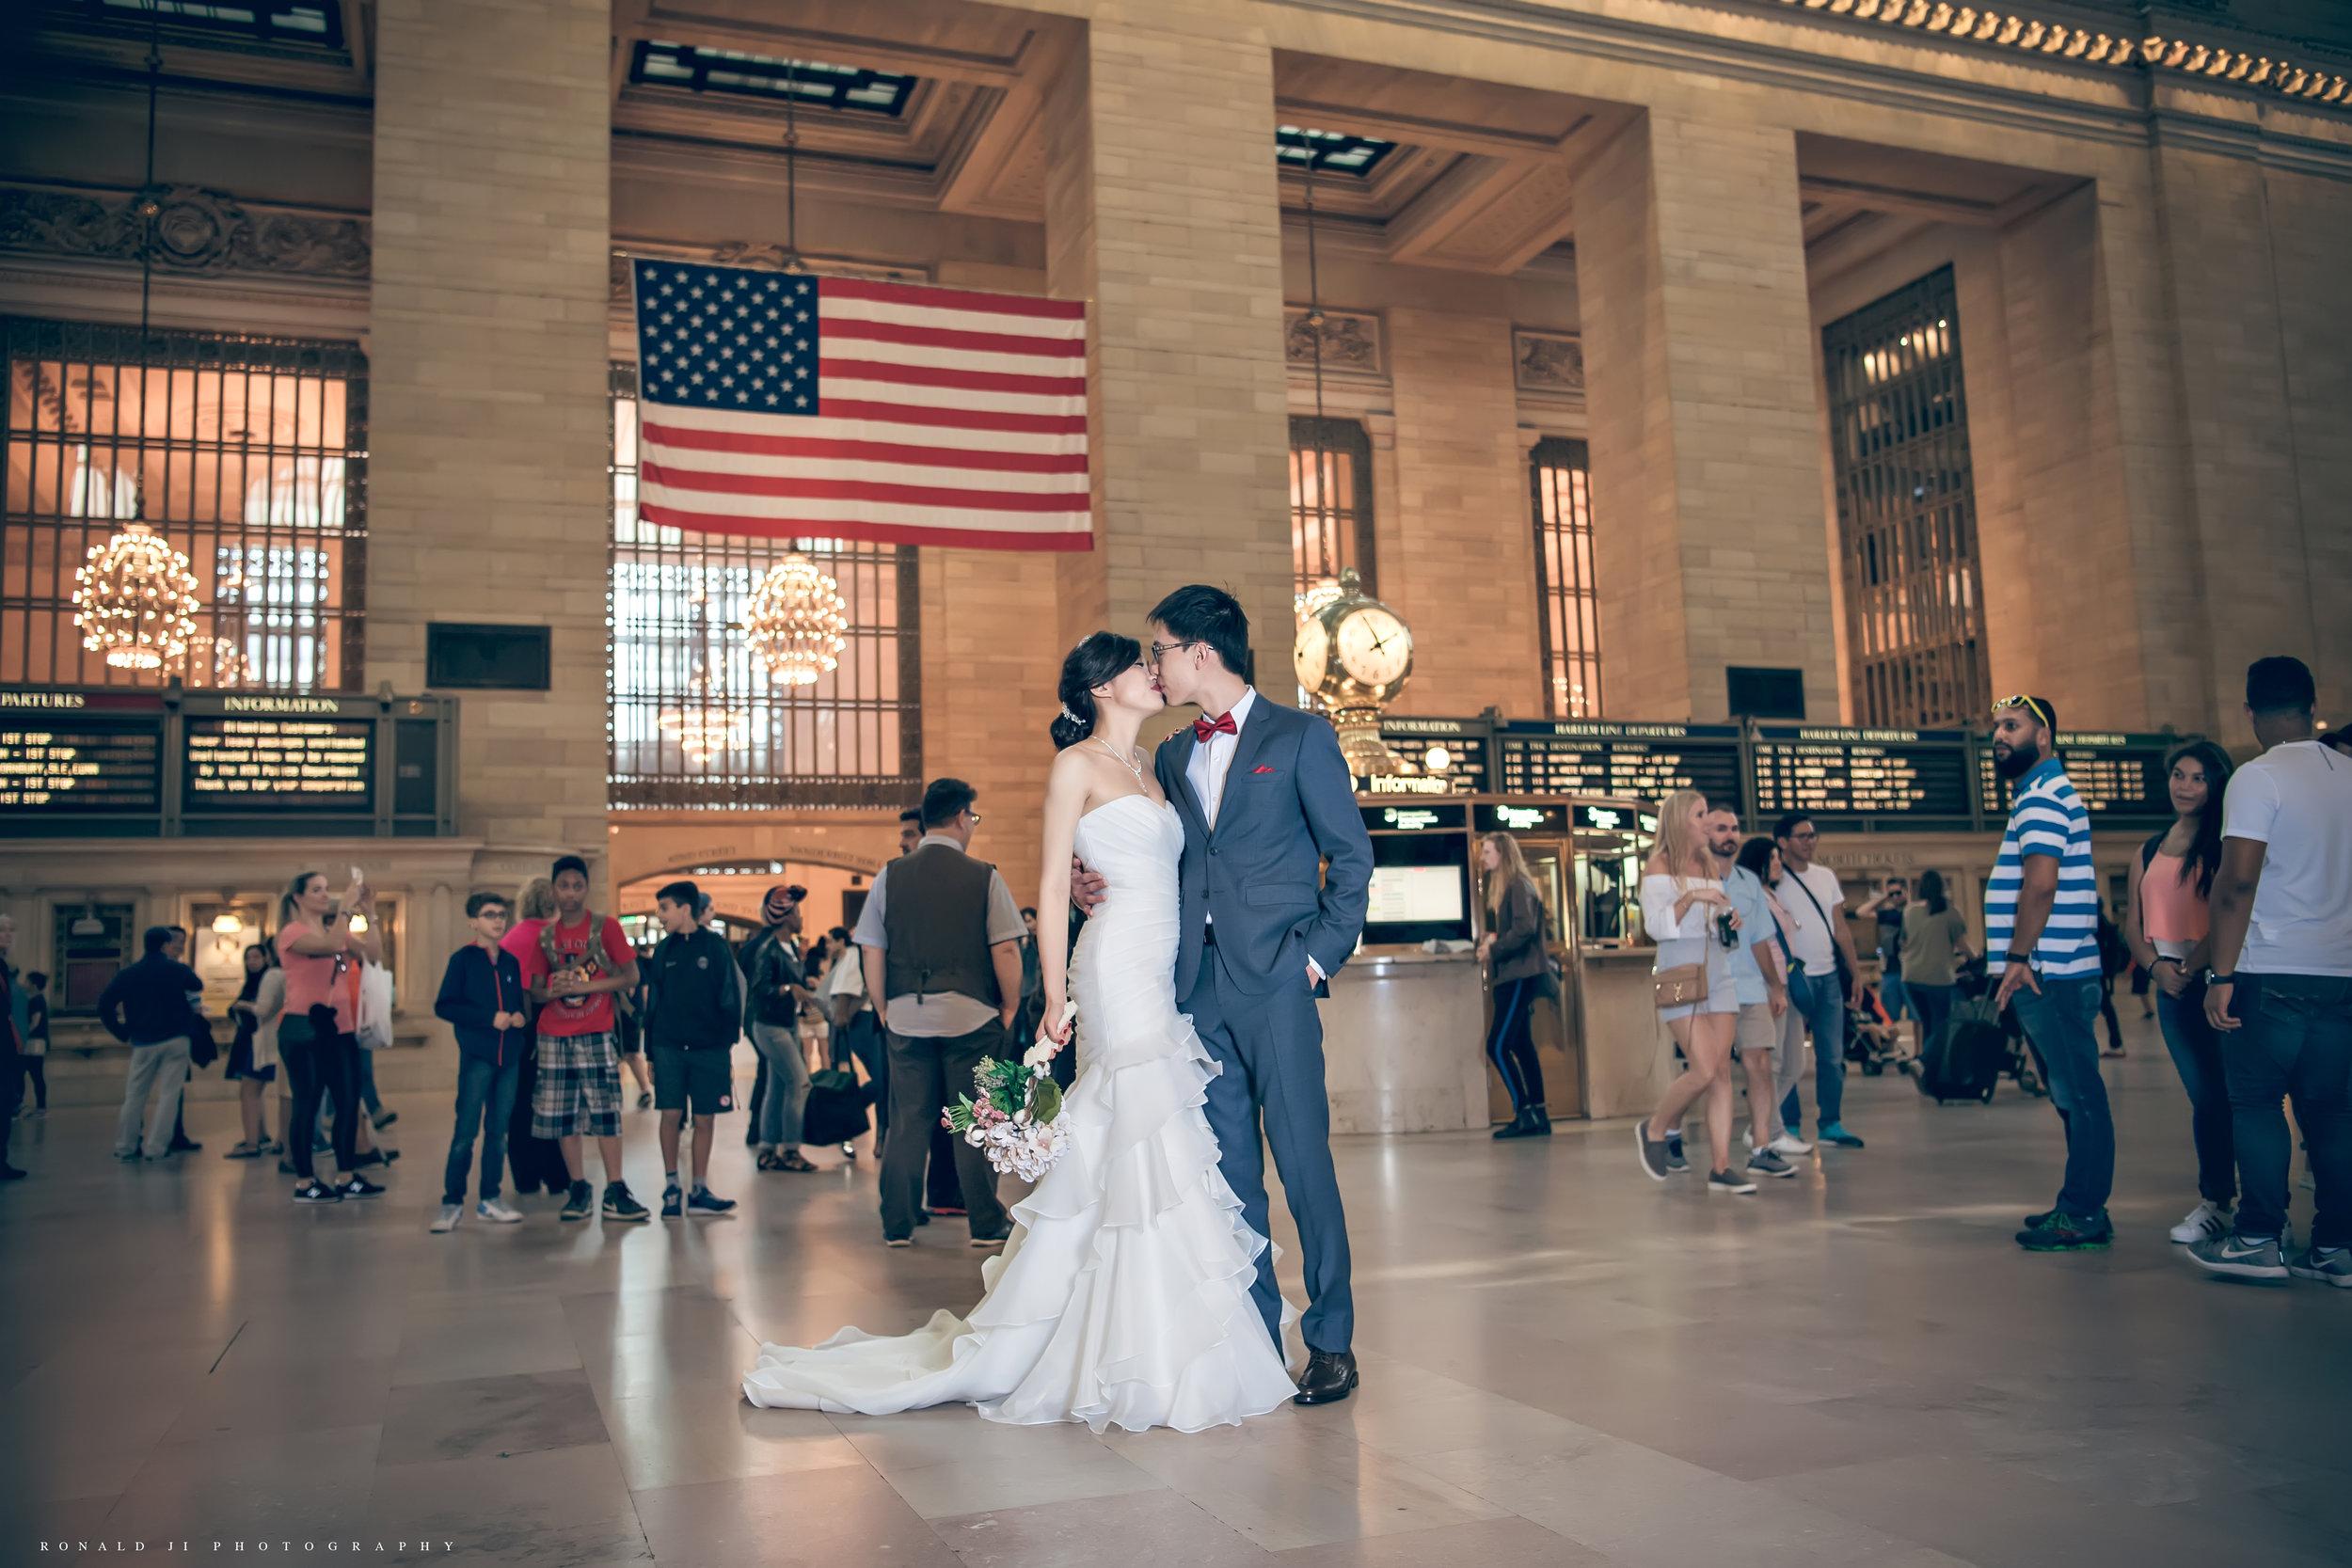 「中央車站 Grand Central」By Ronald Ji